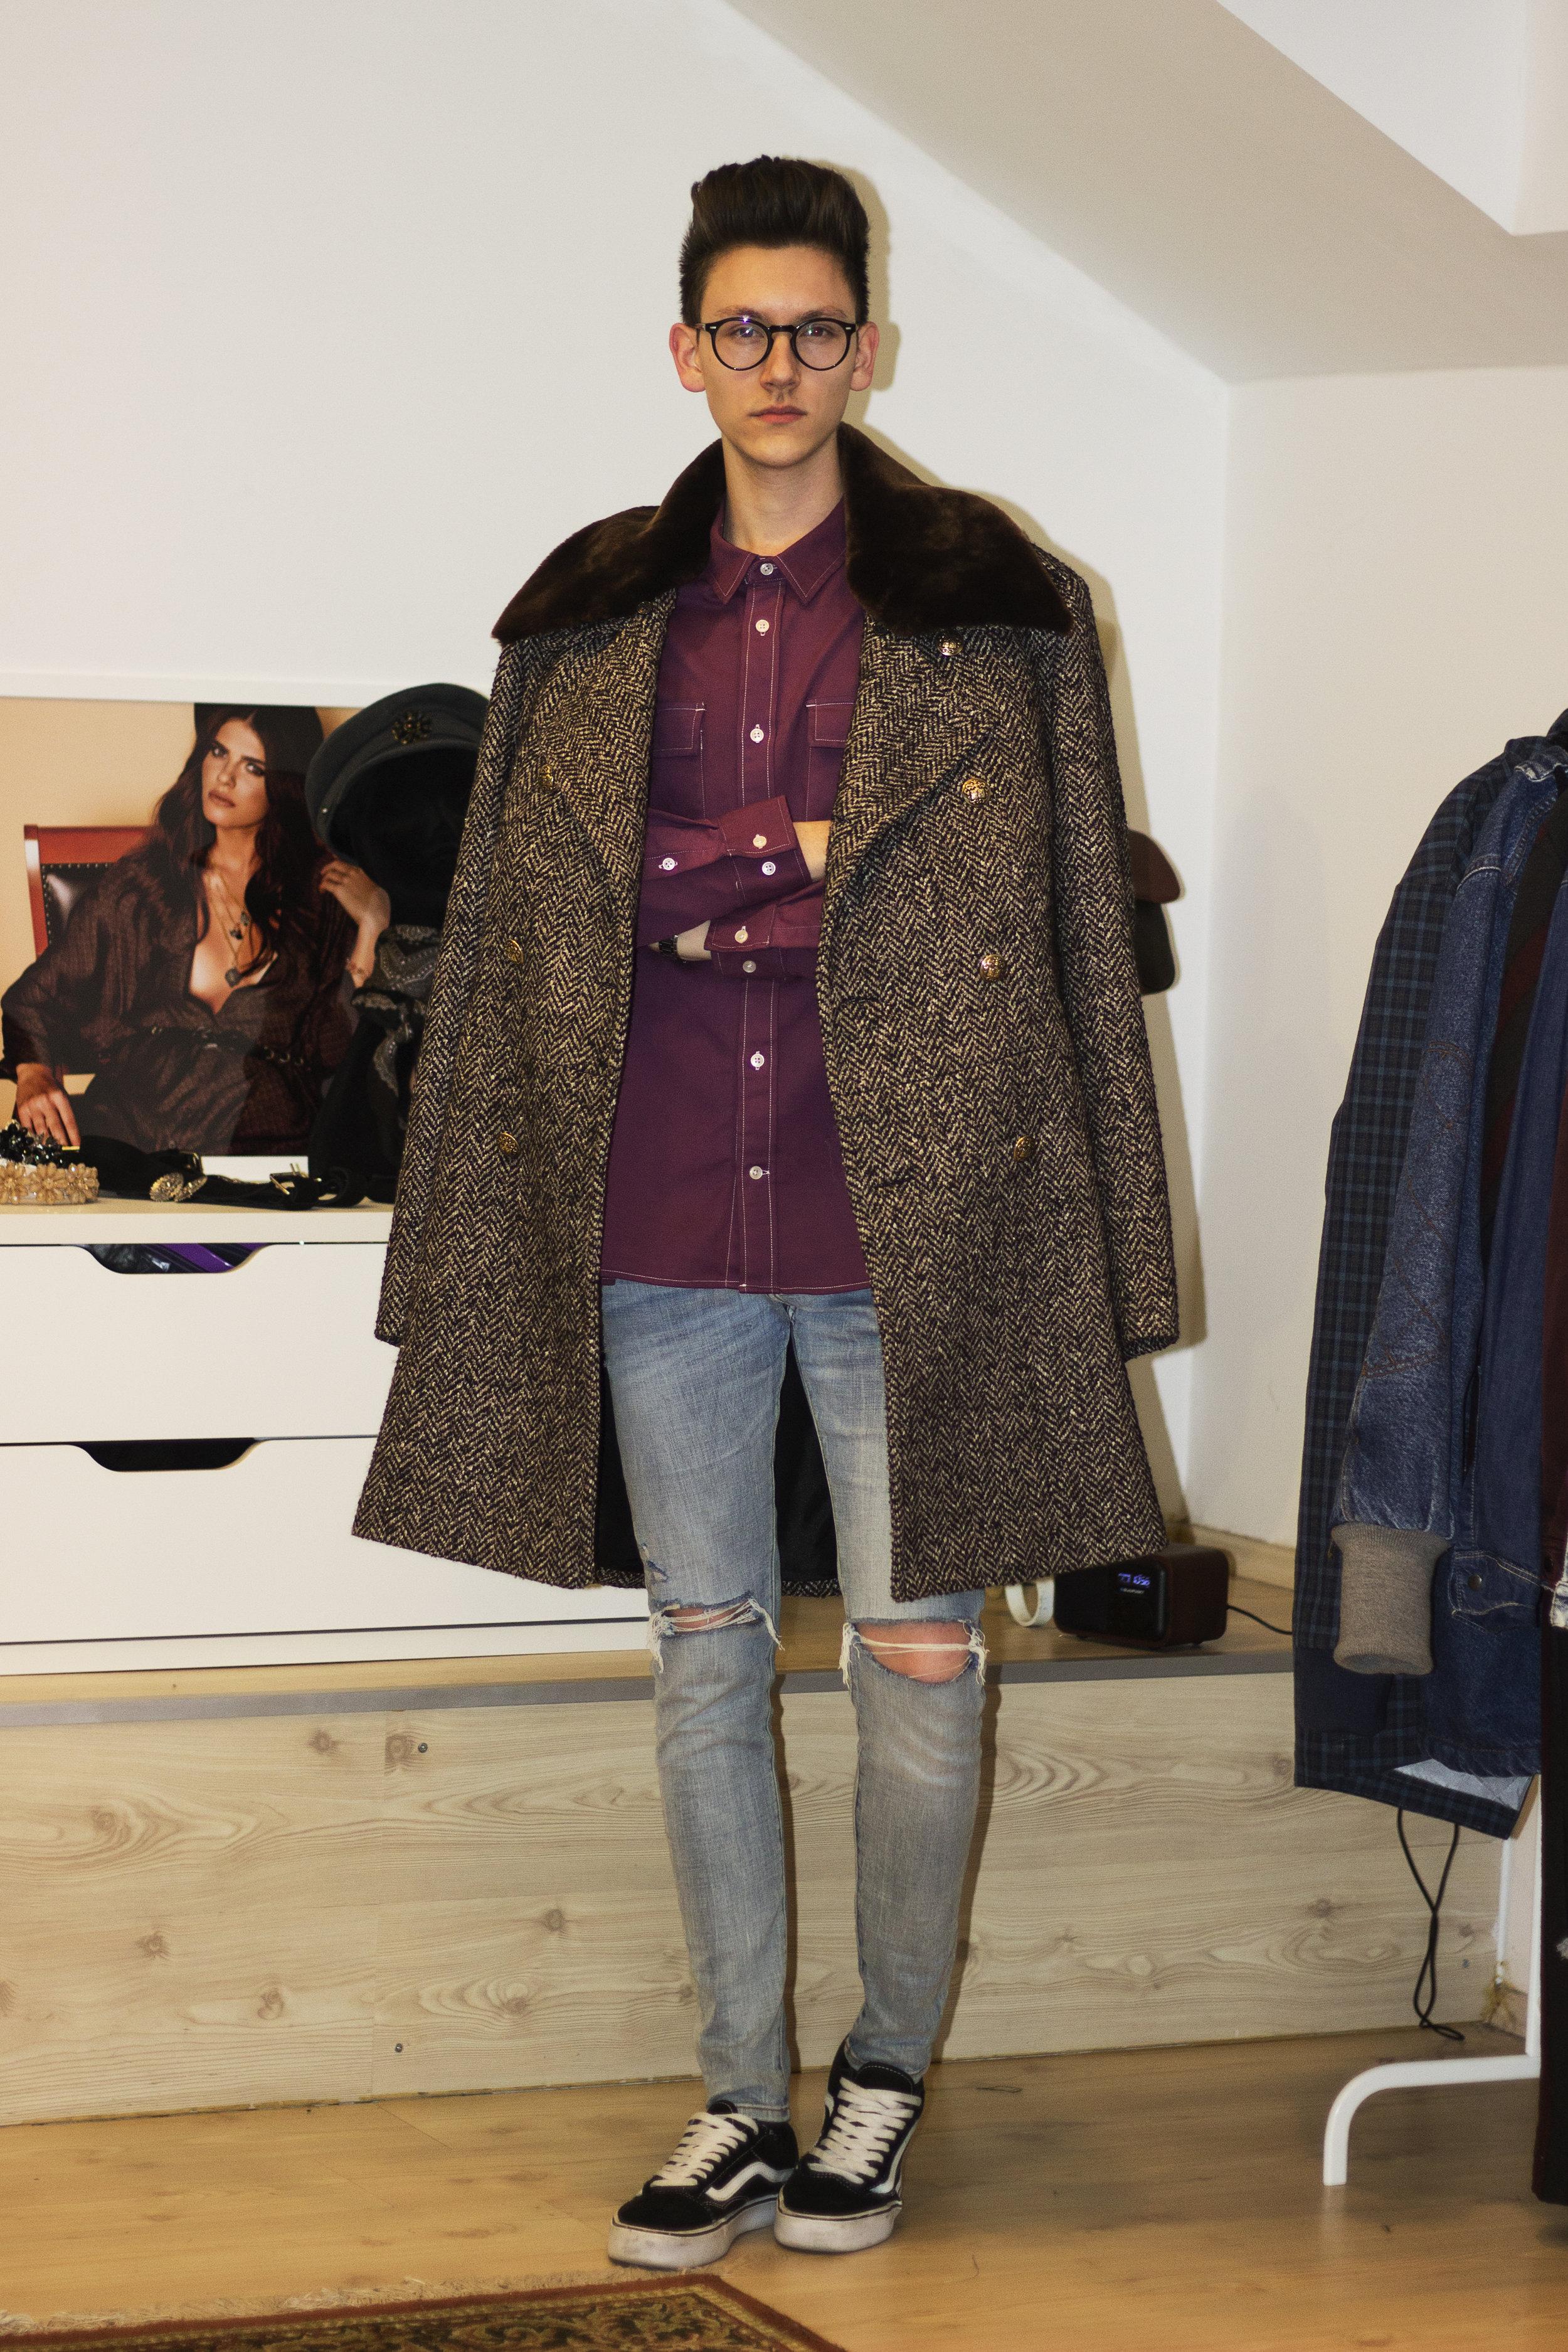 robert-sever-kristina-showroom-croatian-designer-expensive-reality-bipa-fashion-hr (6).jpg